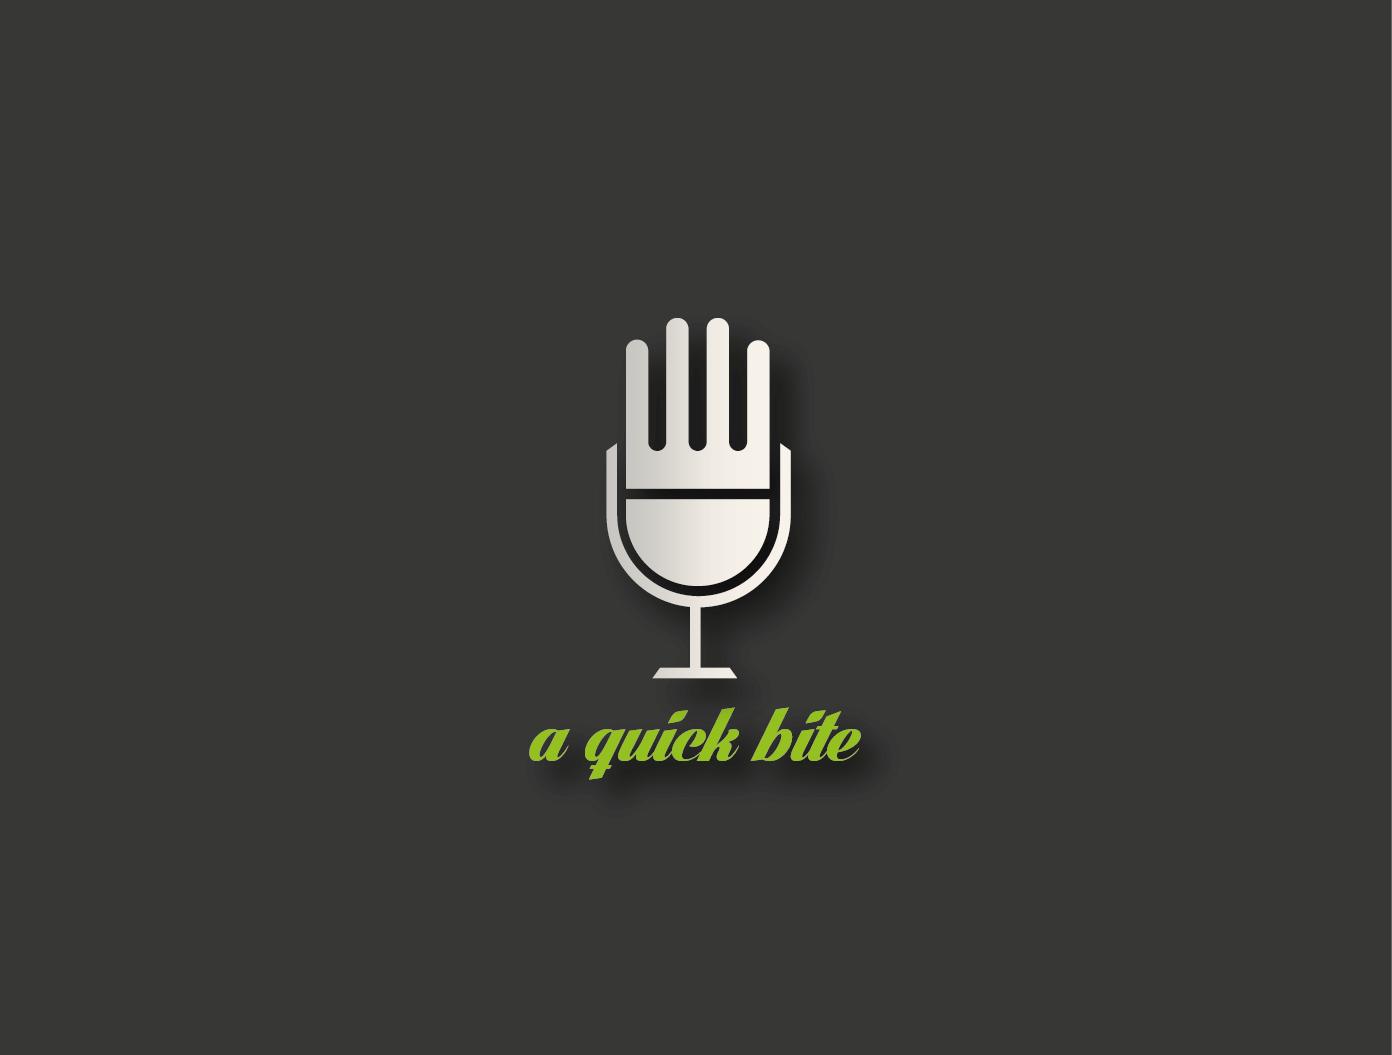 Radio Logo Design for A Quick Bite by greative | Design #3143696